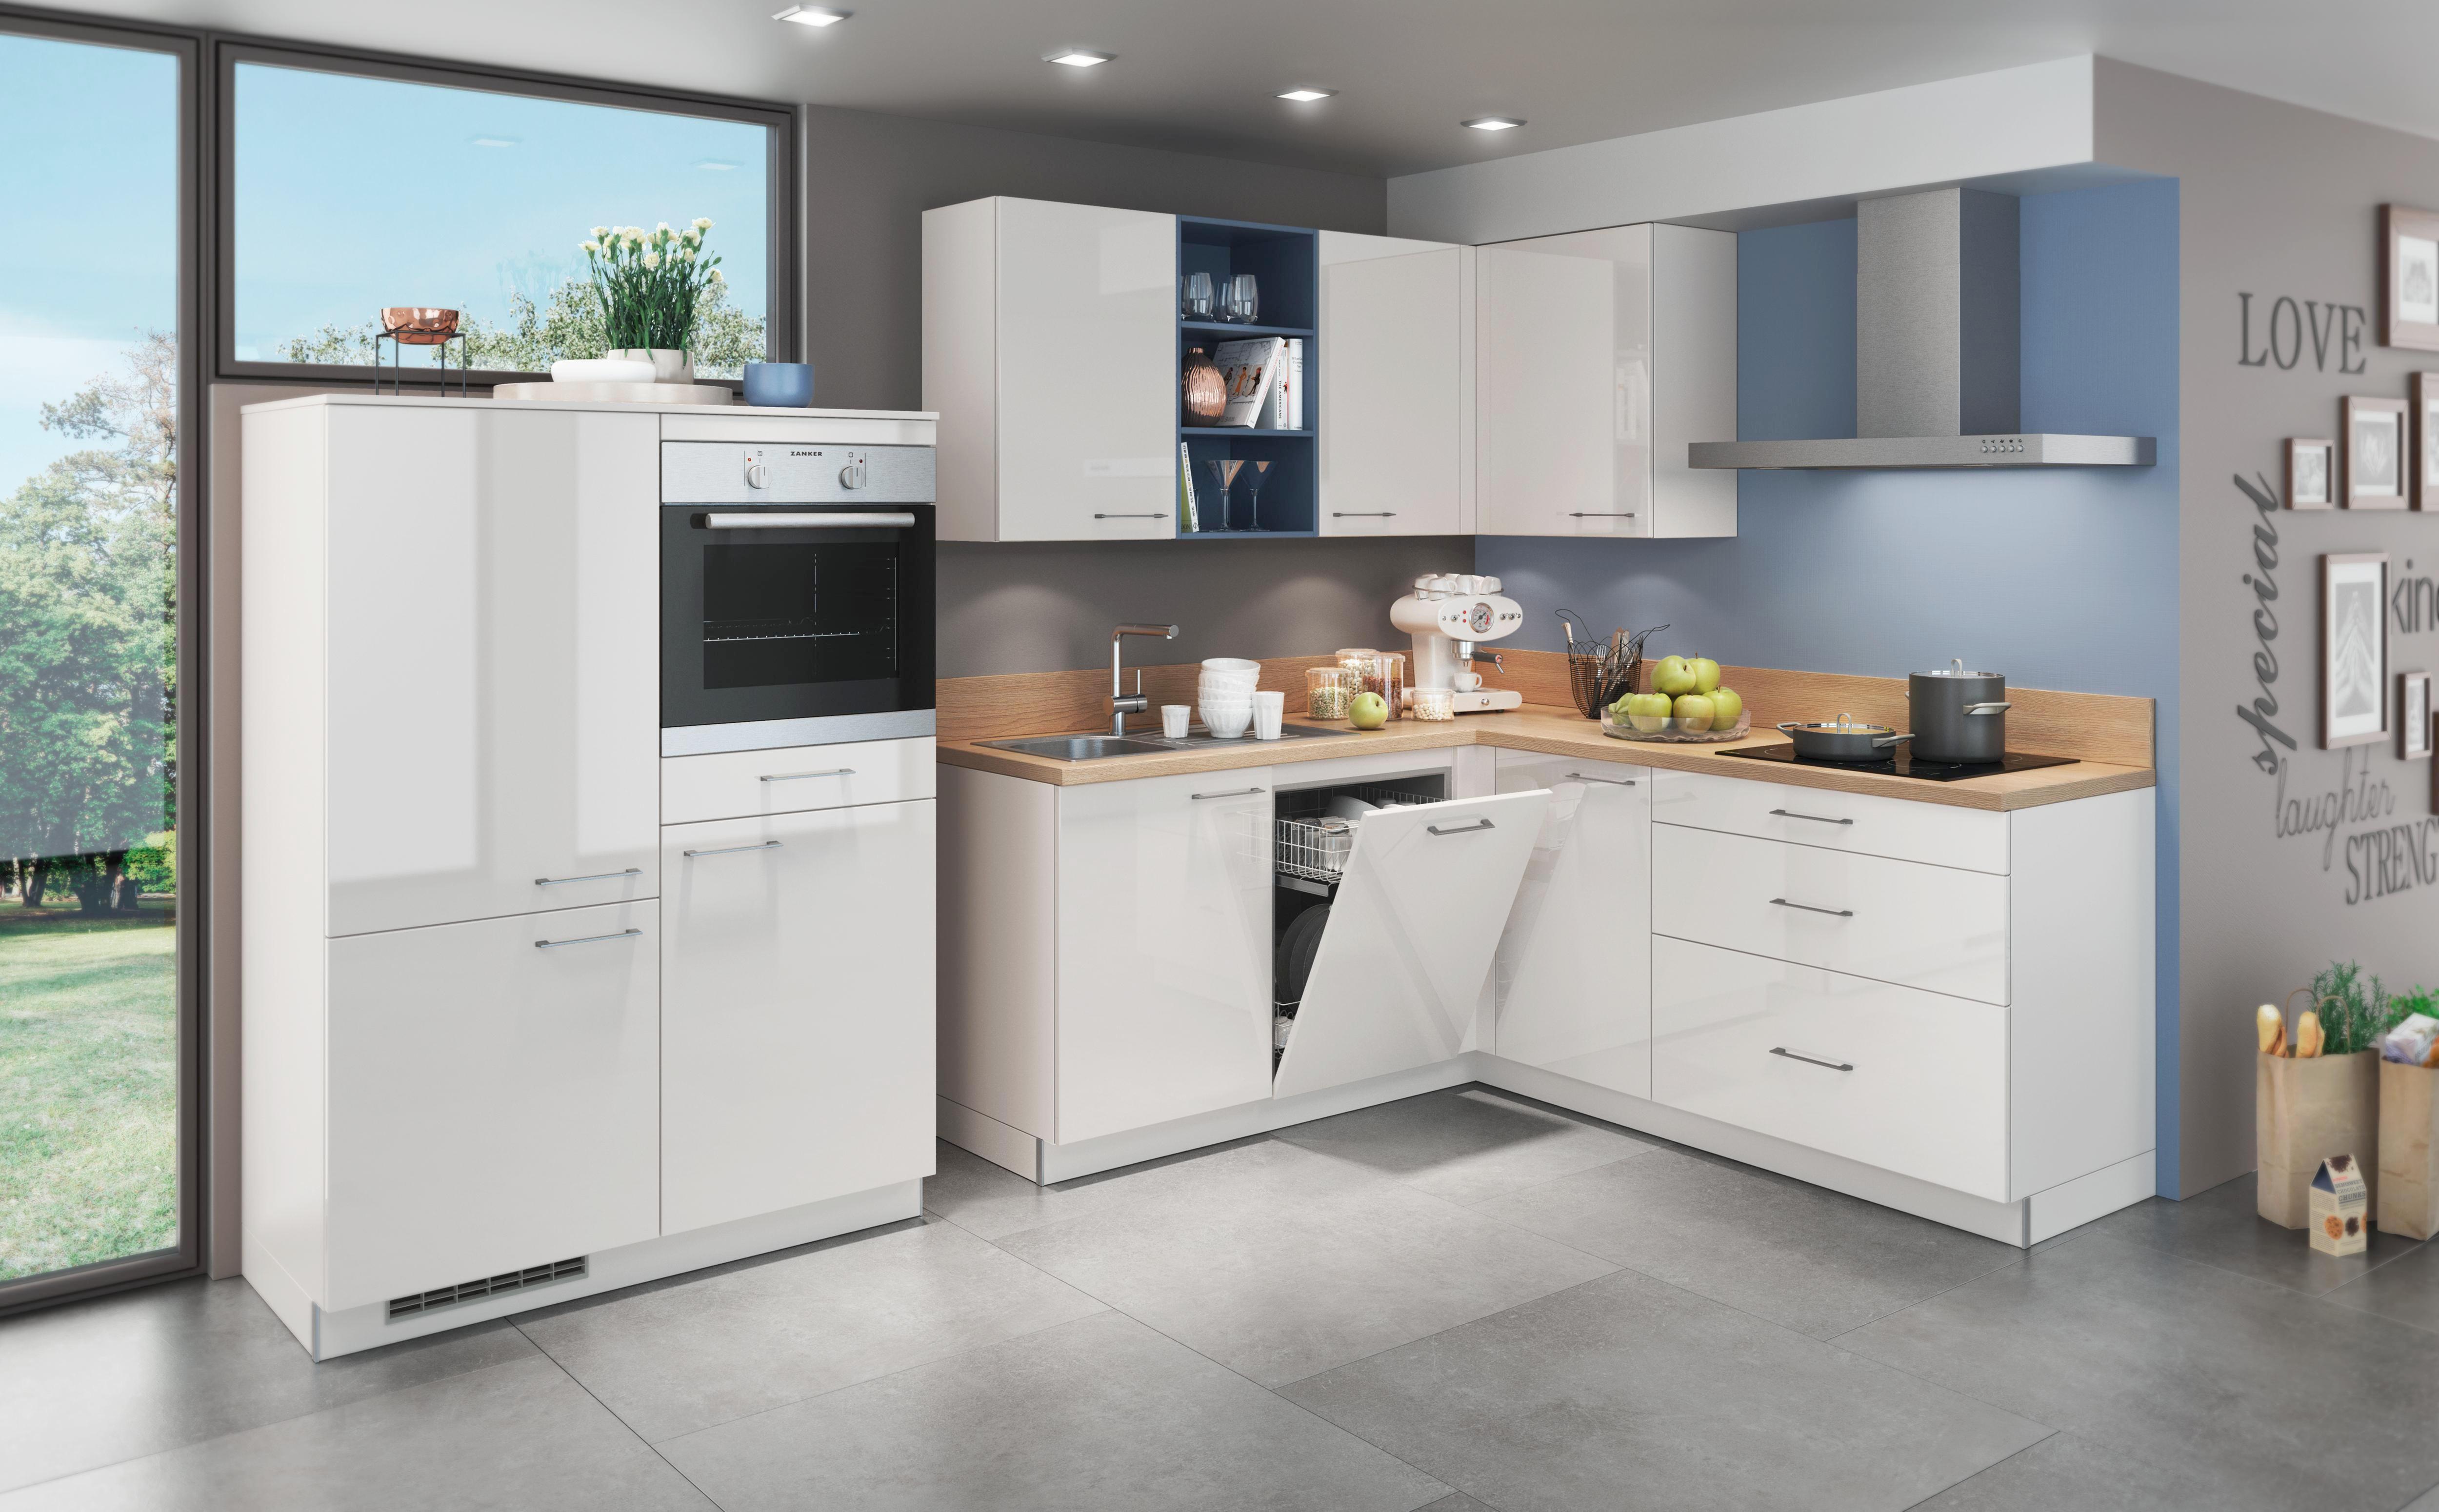 Kühlschrank Xxxl : EckkÜche online kaufen ➤ xxxlutz